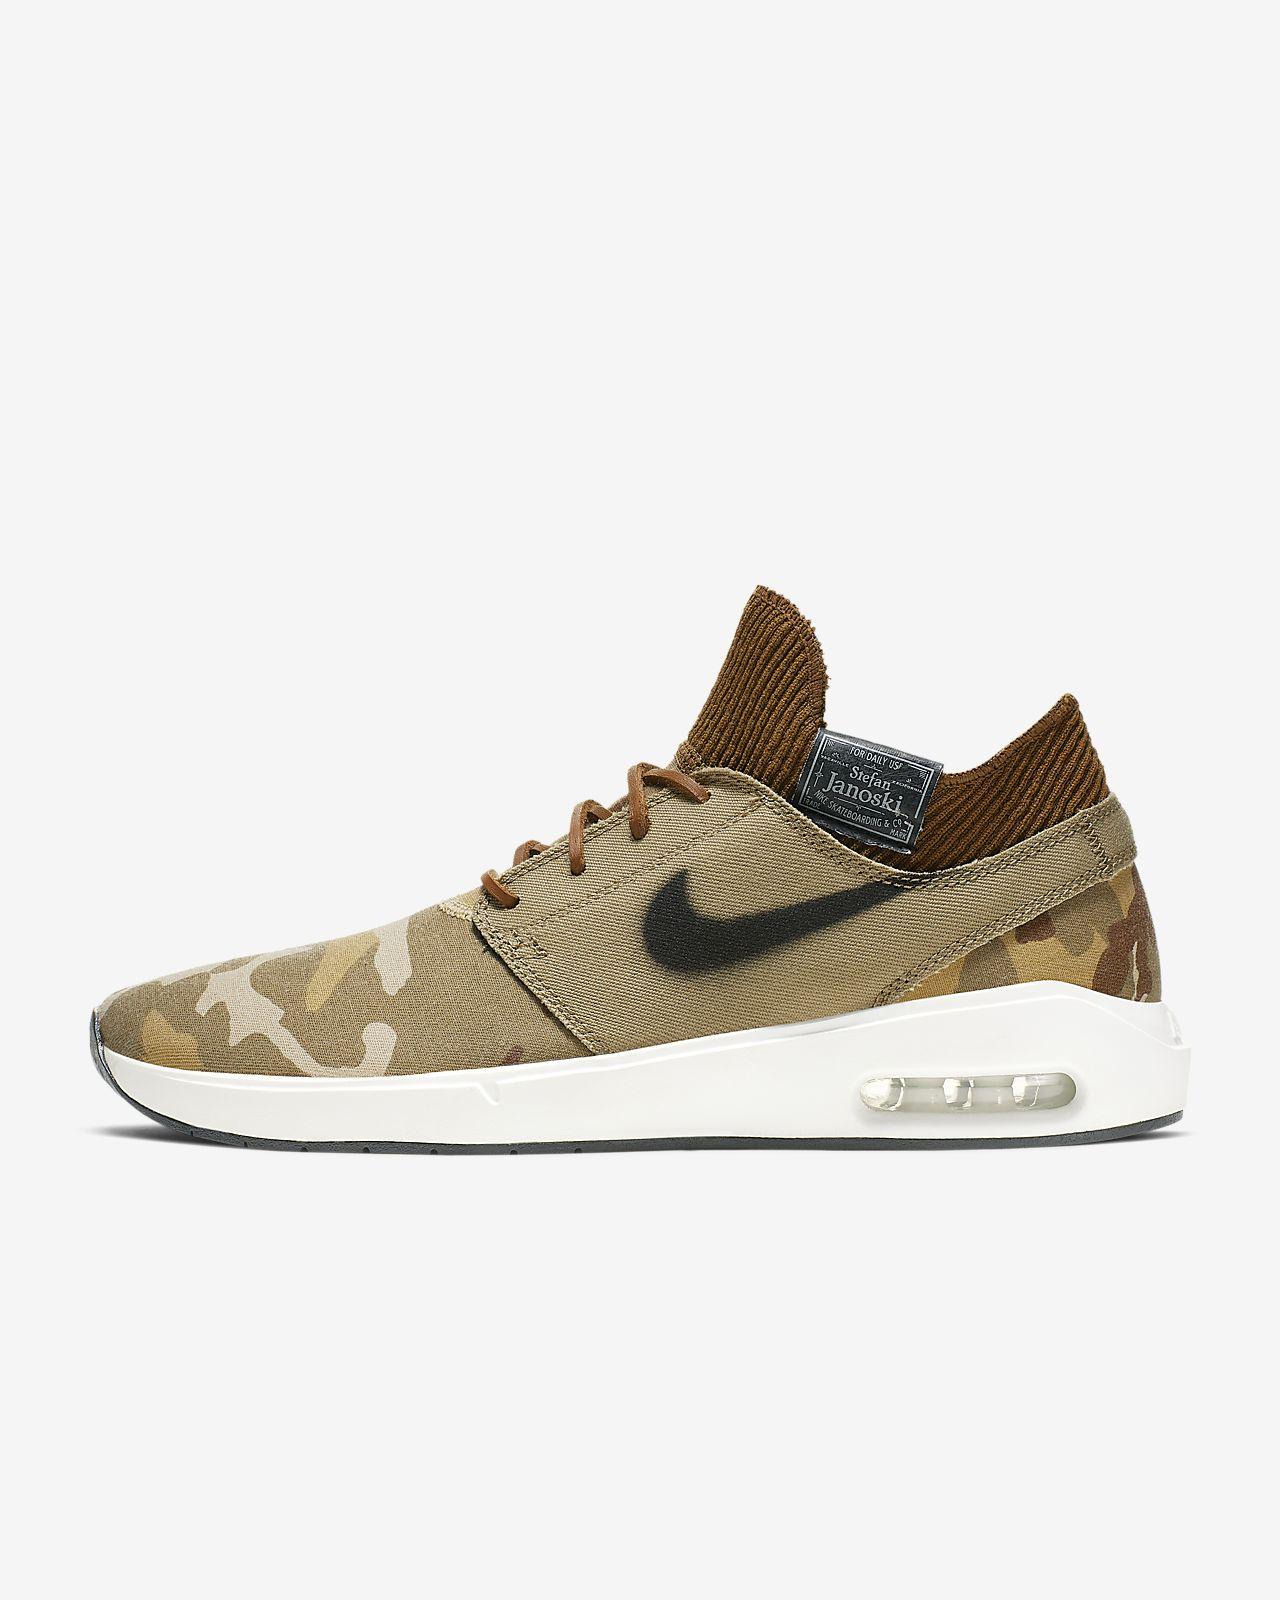 sports shoes 648ac c5ce7 ... Skateboardsko Nike SB Air Max Janoski 2 Premium för män